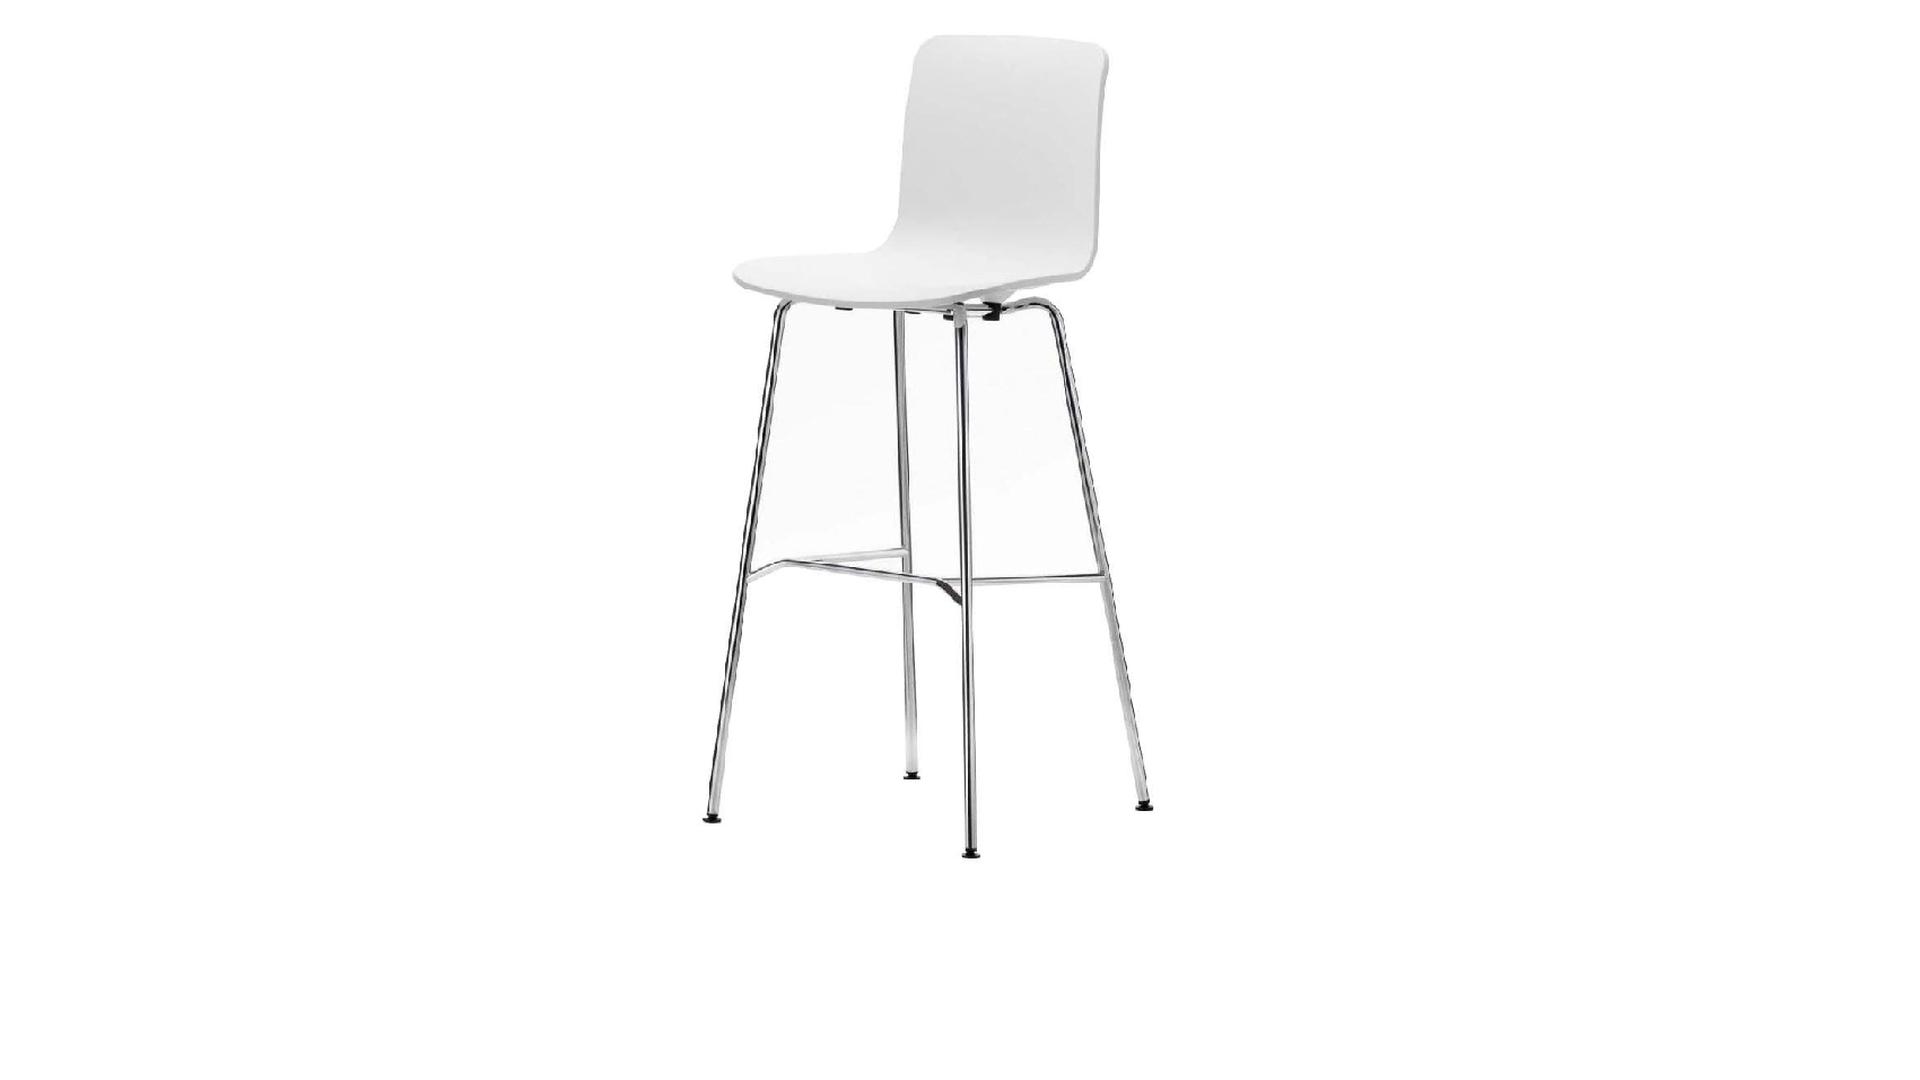 hal stool high 1.png